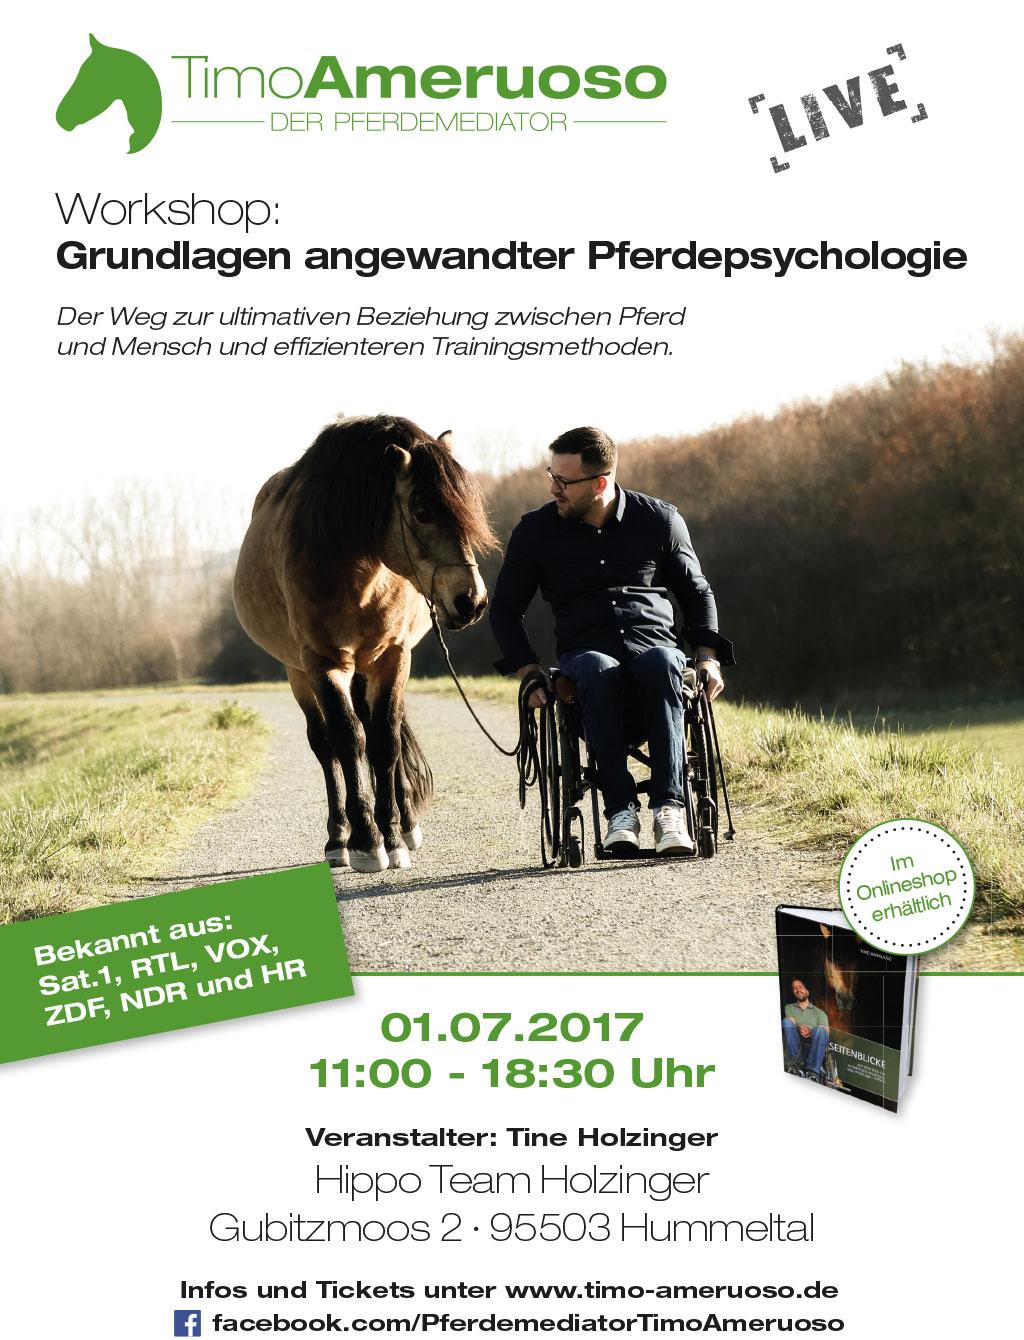 timo-ameruoso-pferdepsychologie-workshop